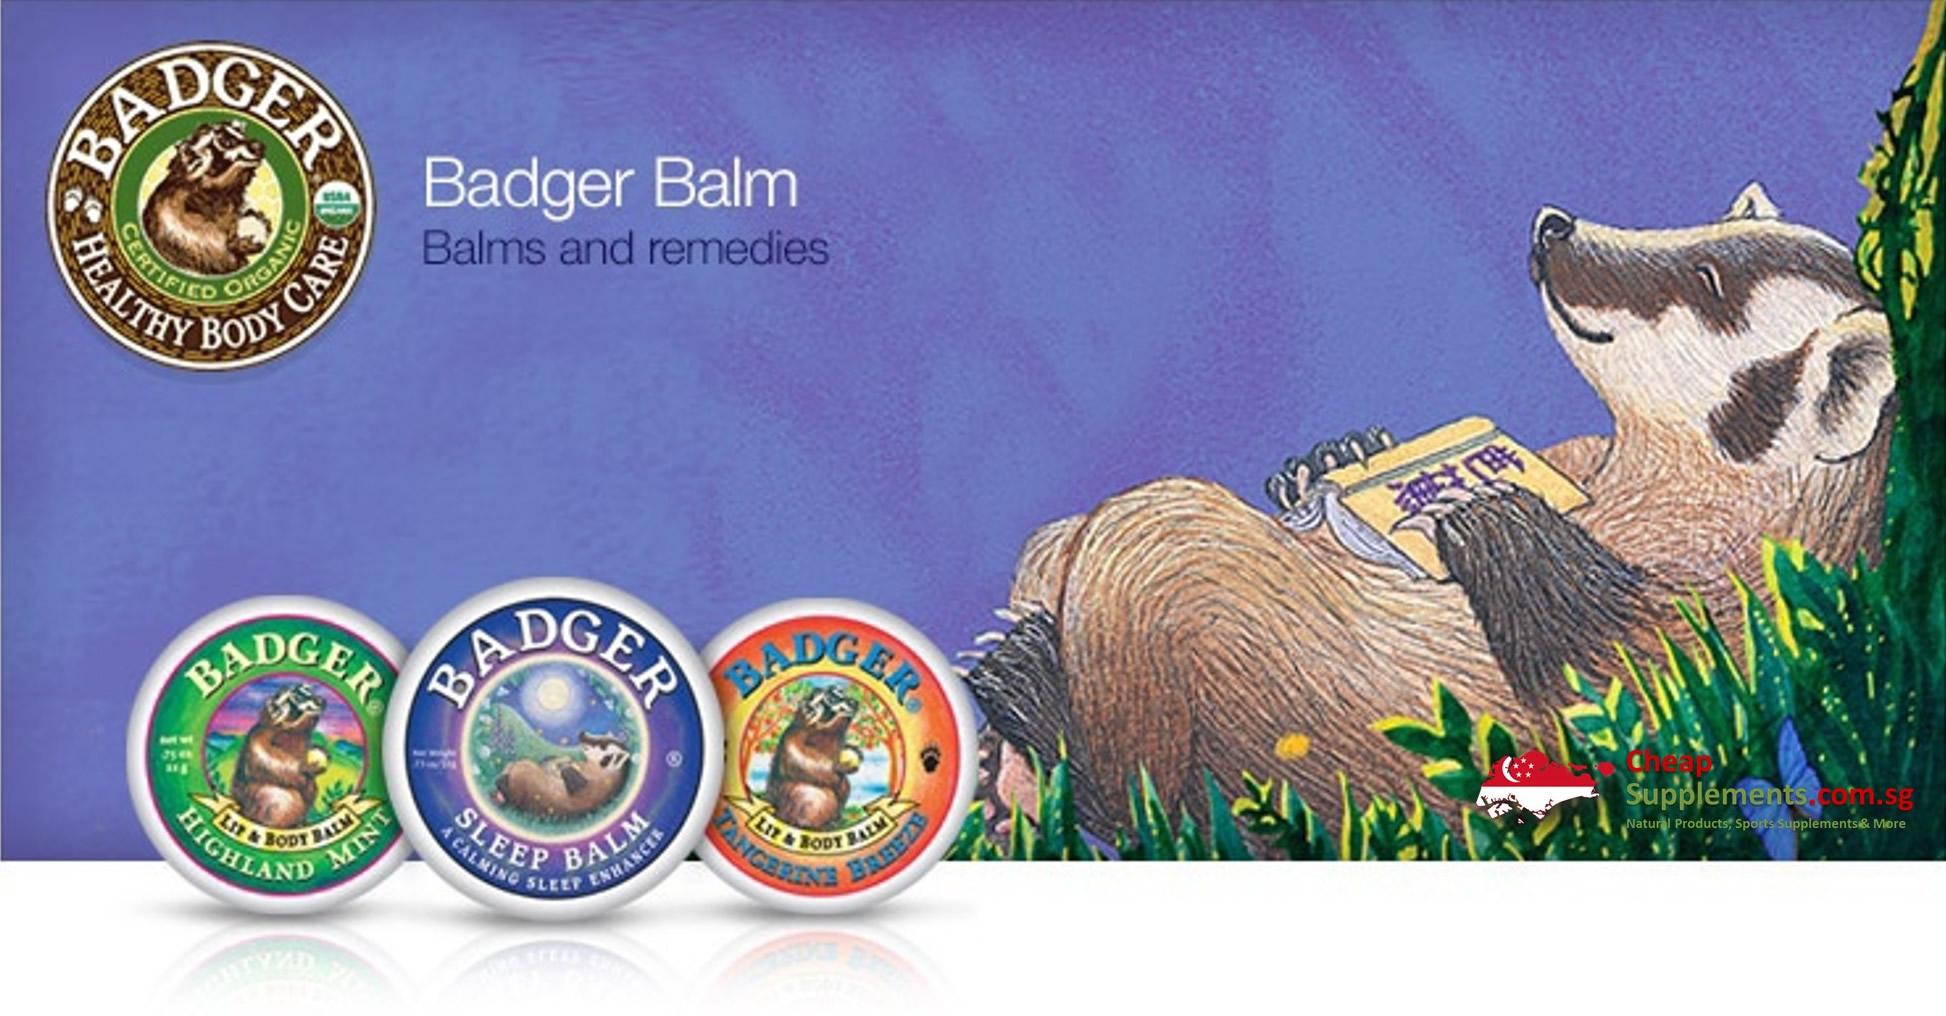 badger balm banner sg singapore